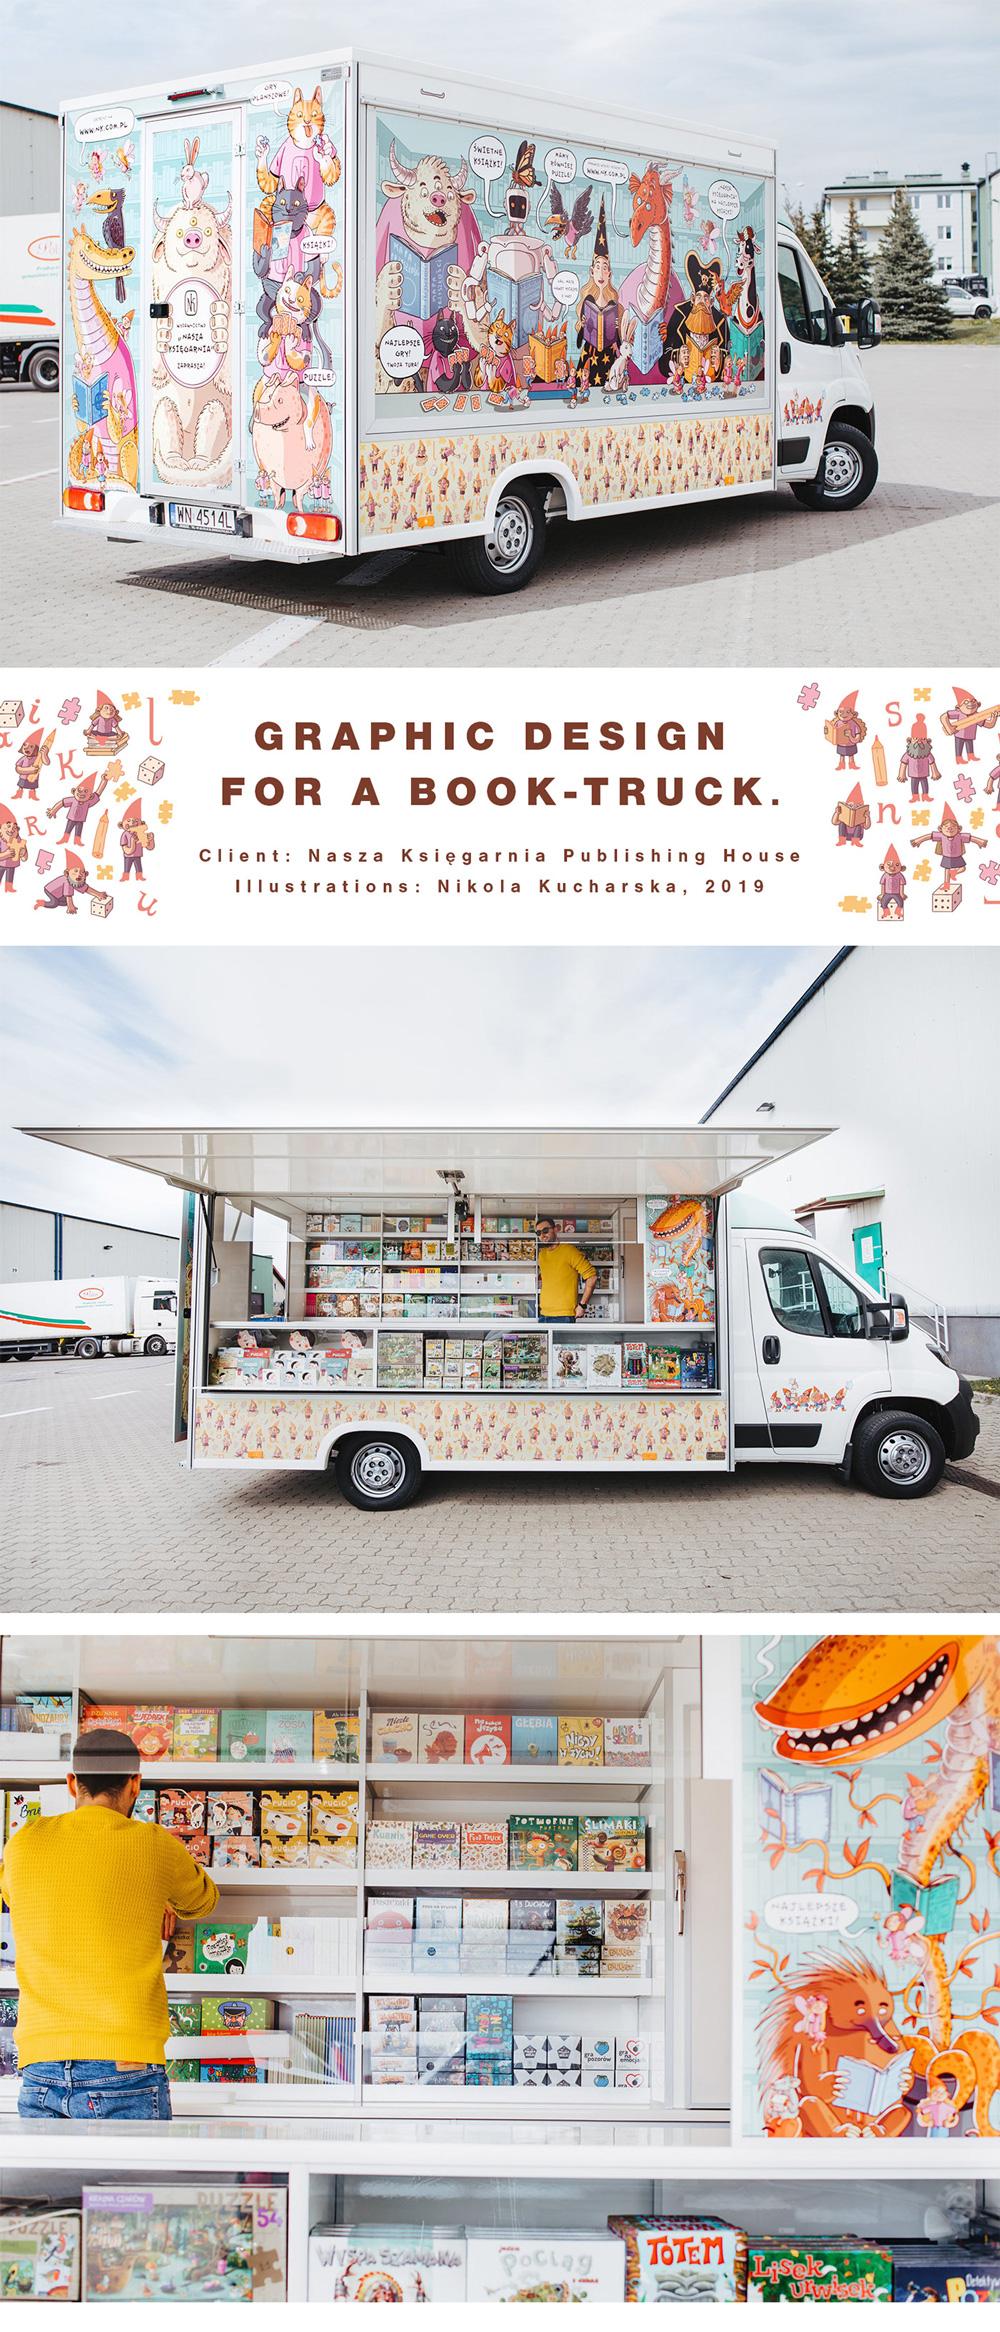 Graphic design for a Book-Truck, Nikola Kucharska